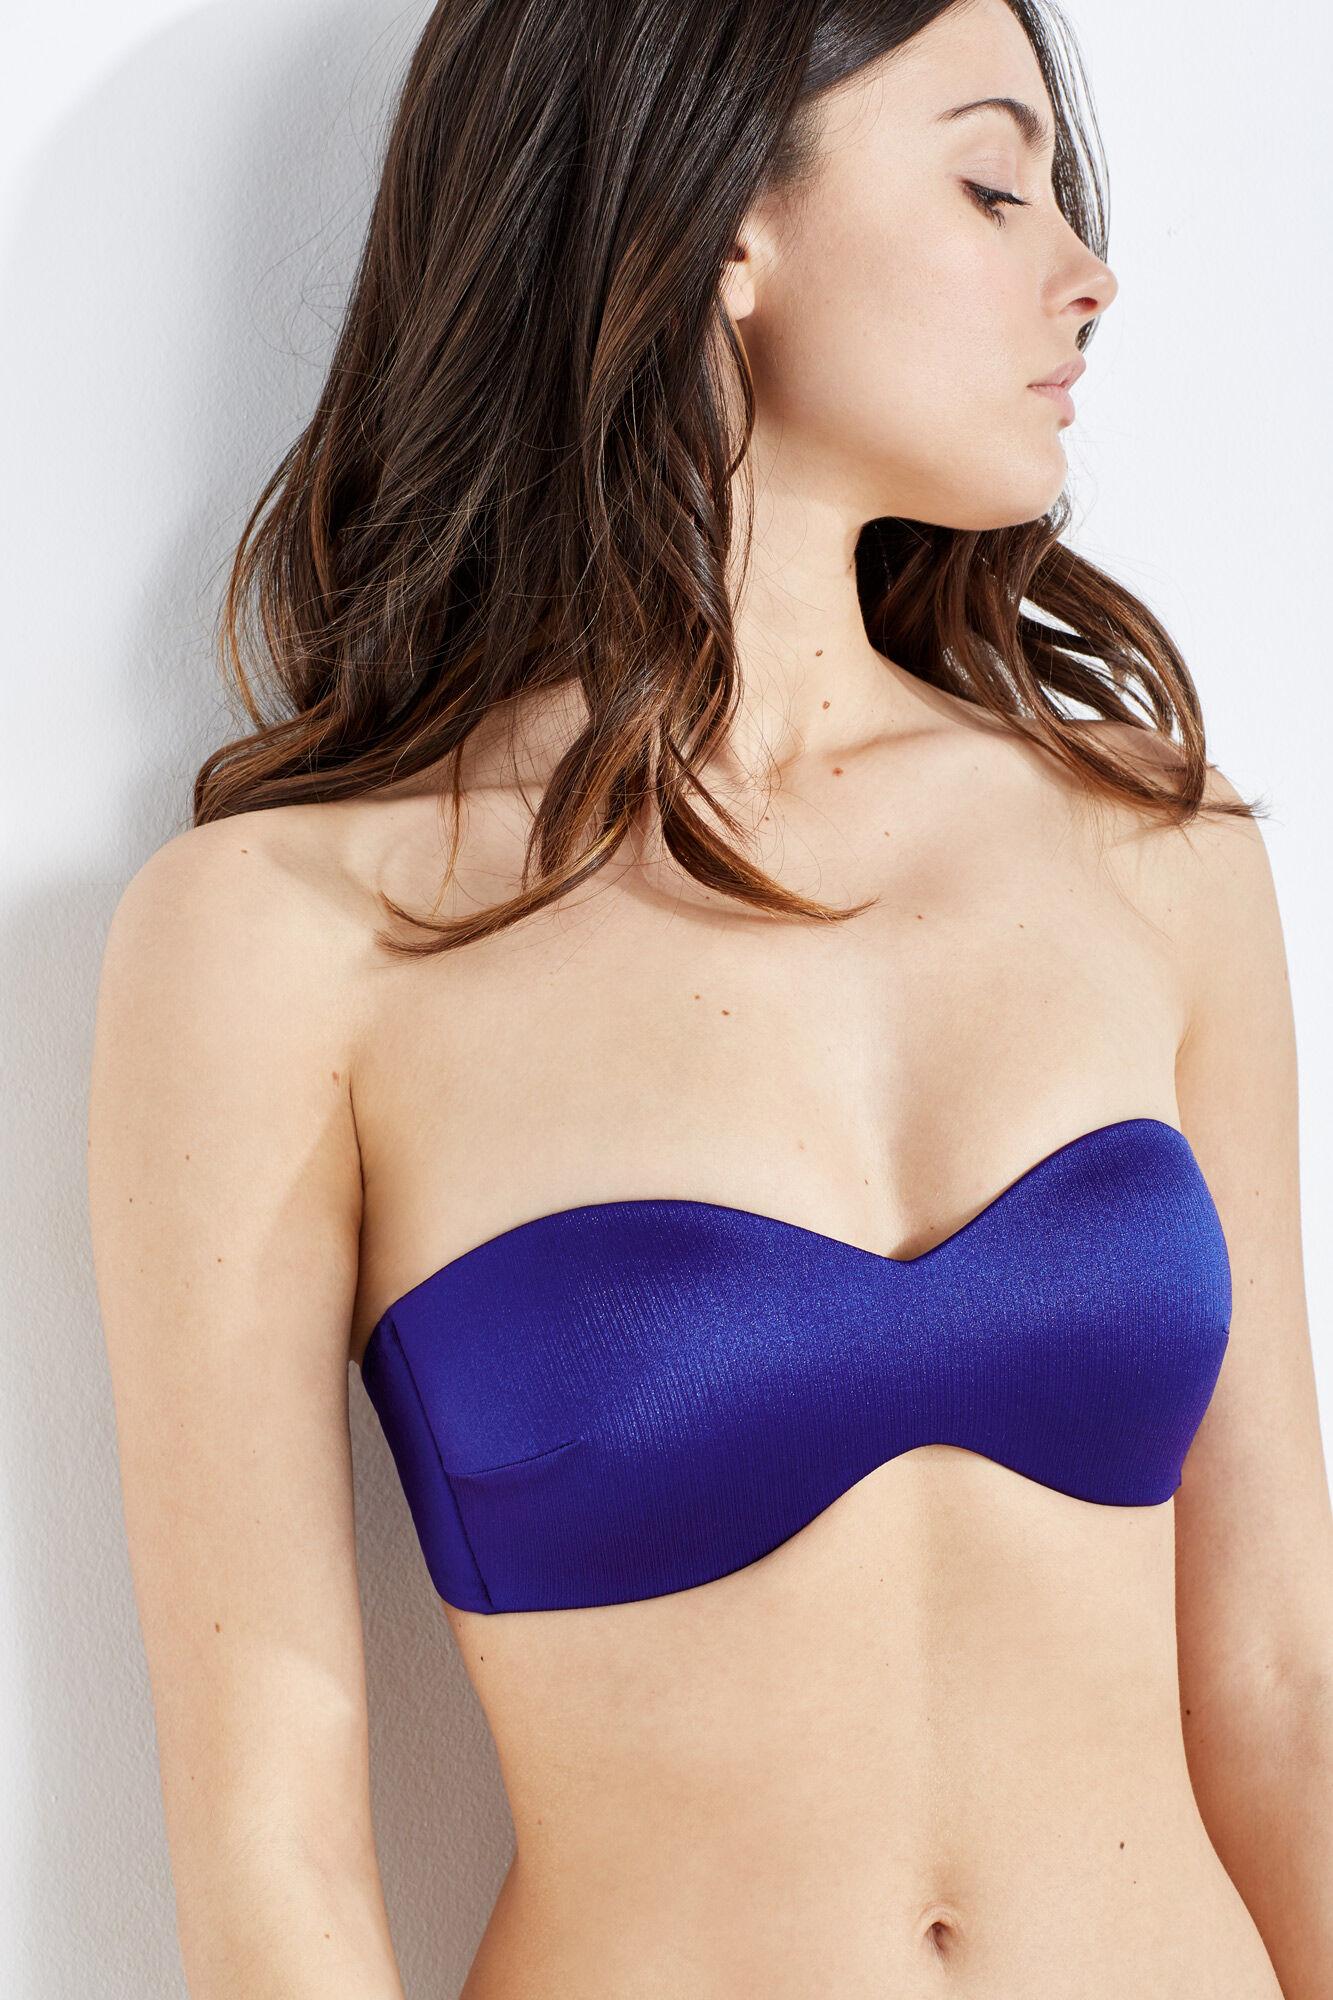 018ad8c5d5 Bandeau bikini top